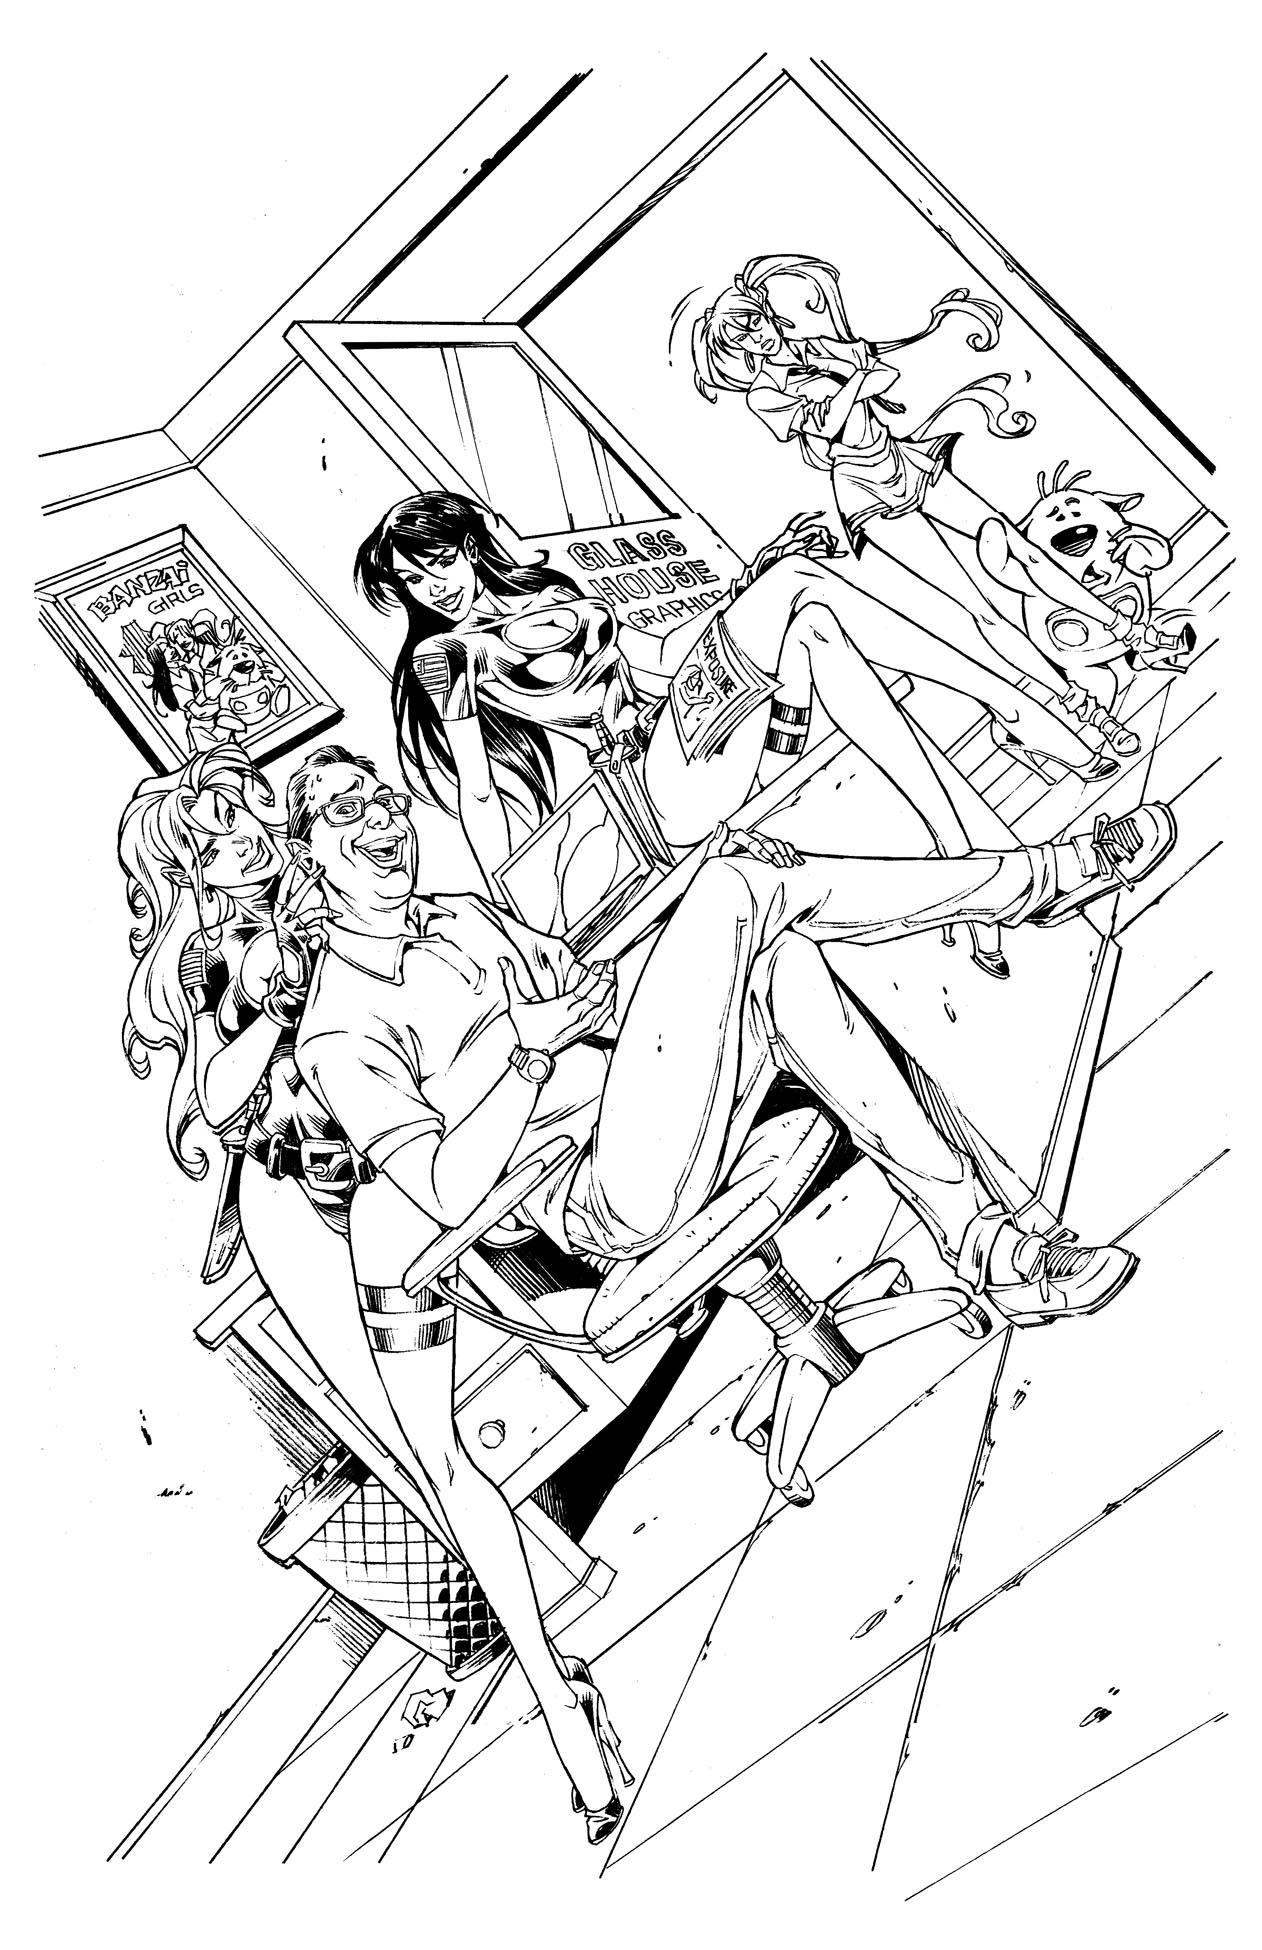 EXPOSURE & BANZAI GIRL: WHO'S THEIR DADDY? Line Art by Jinky Coronado